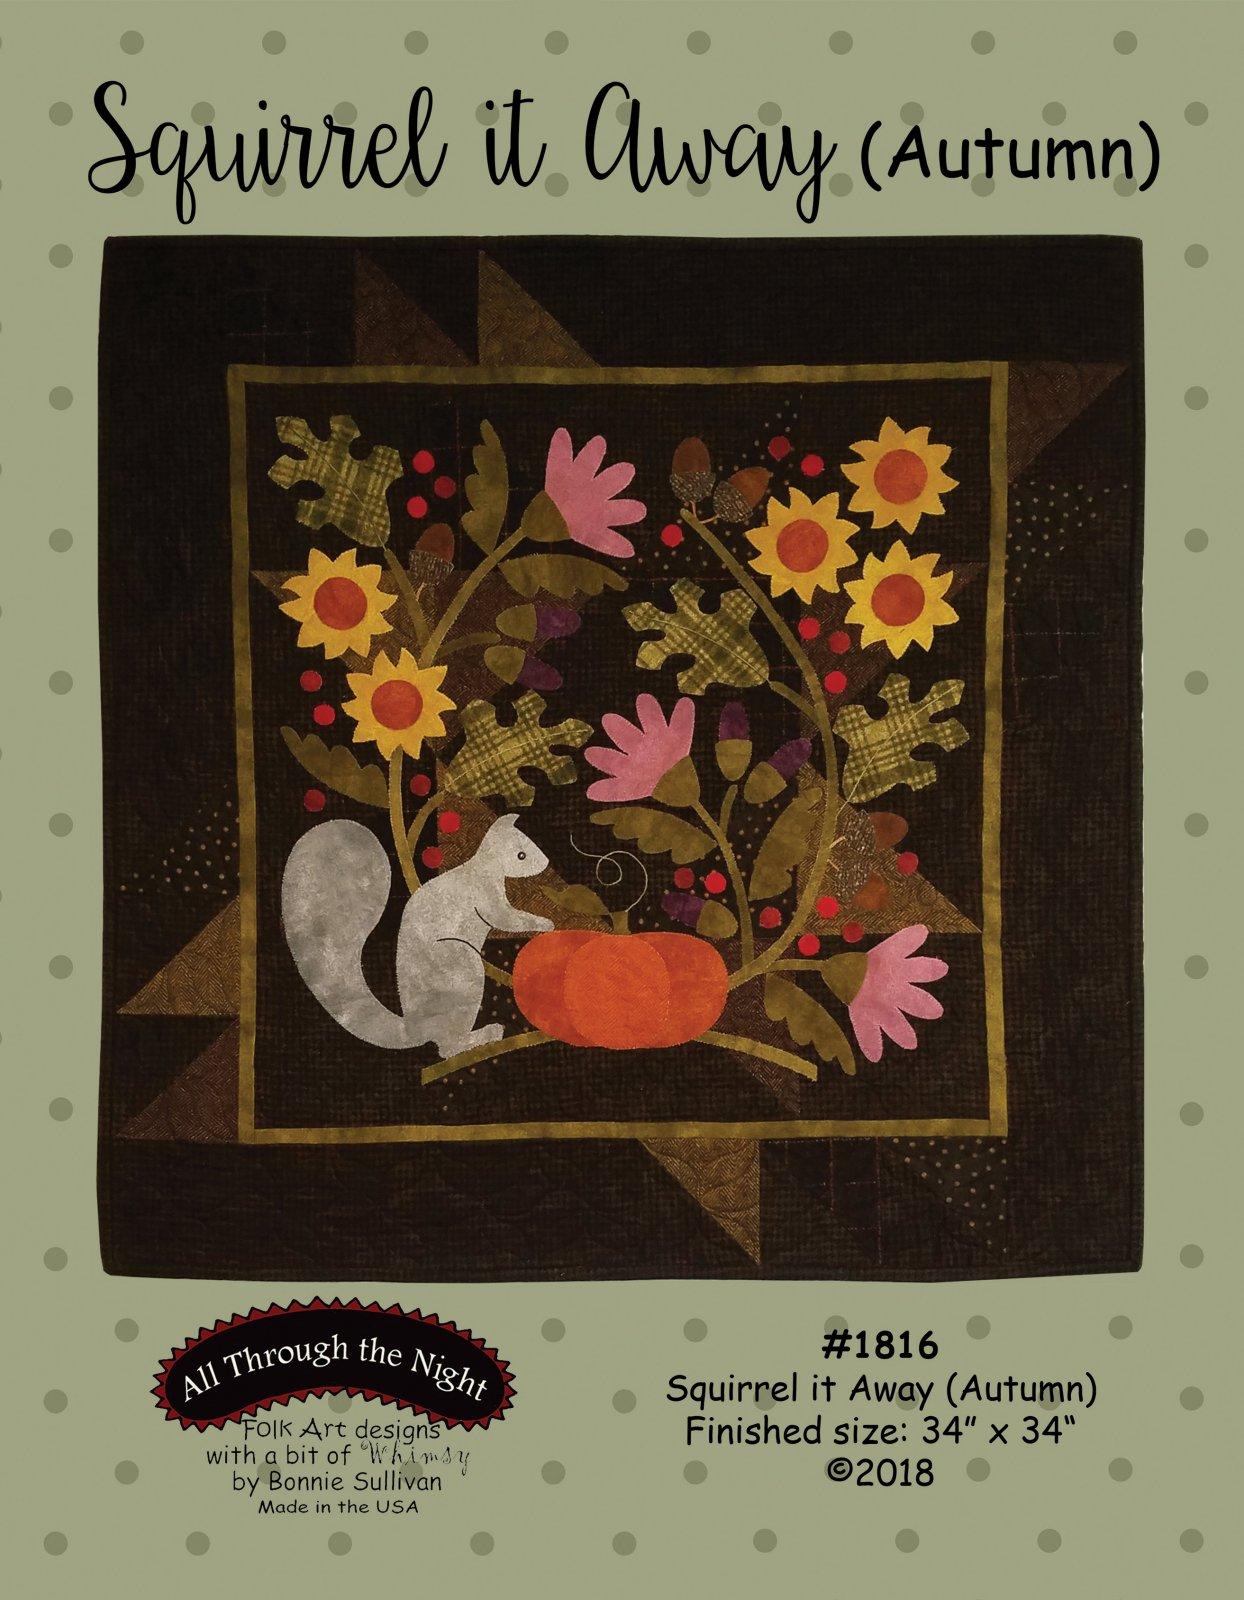 1816 Squirrel it Away Autumn